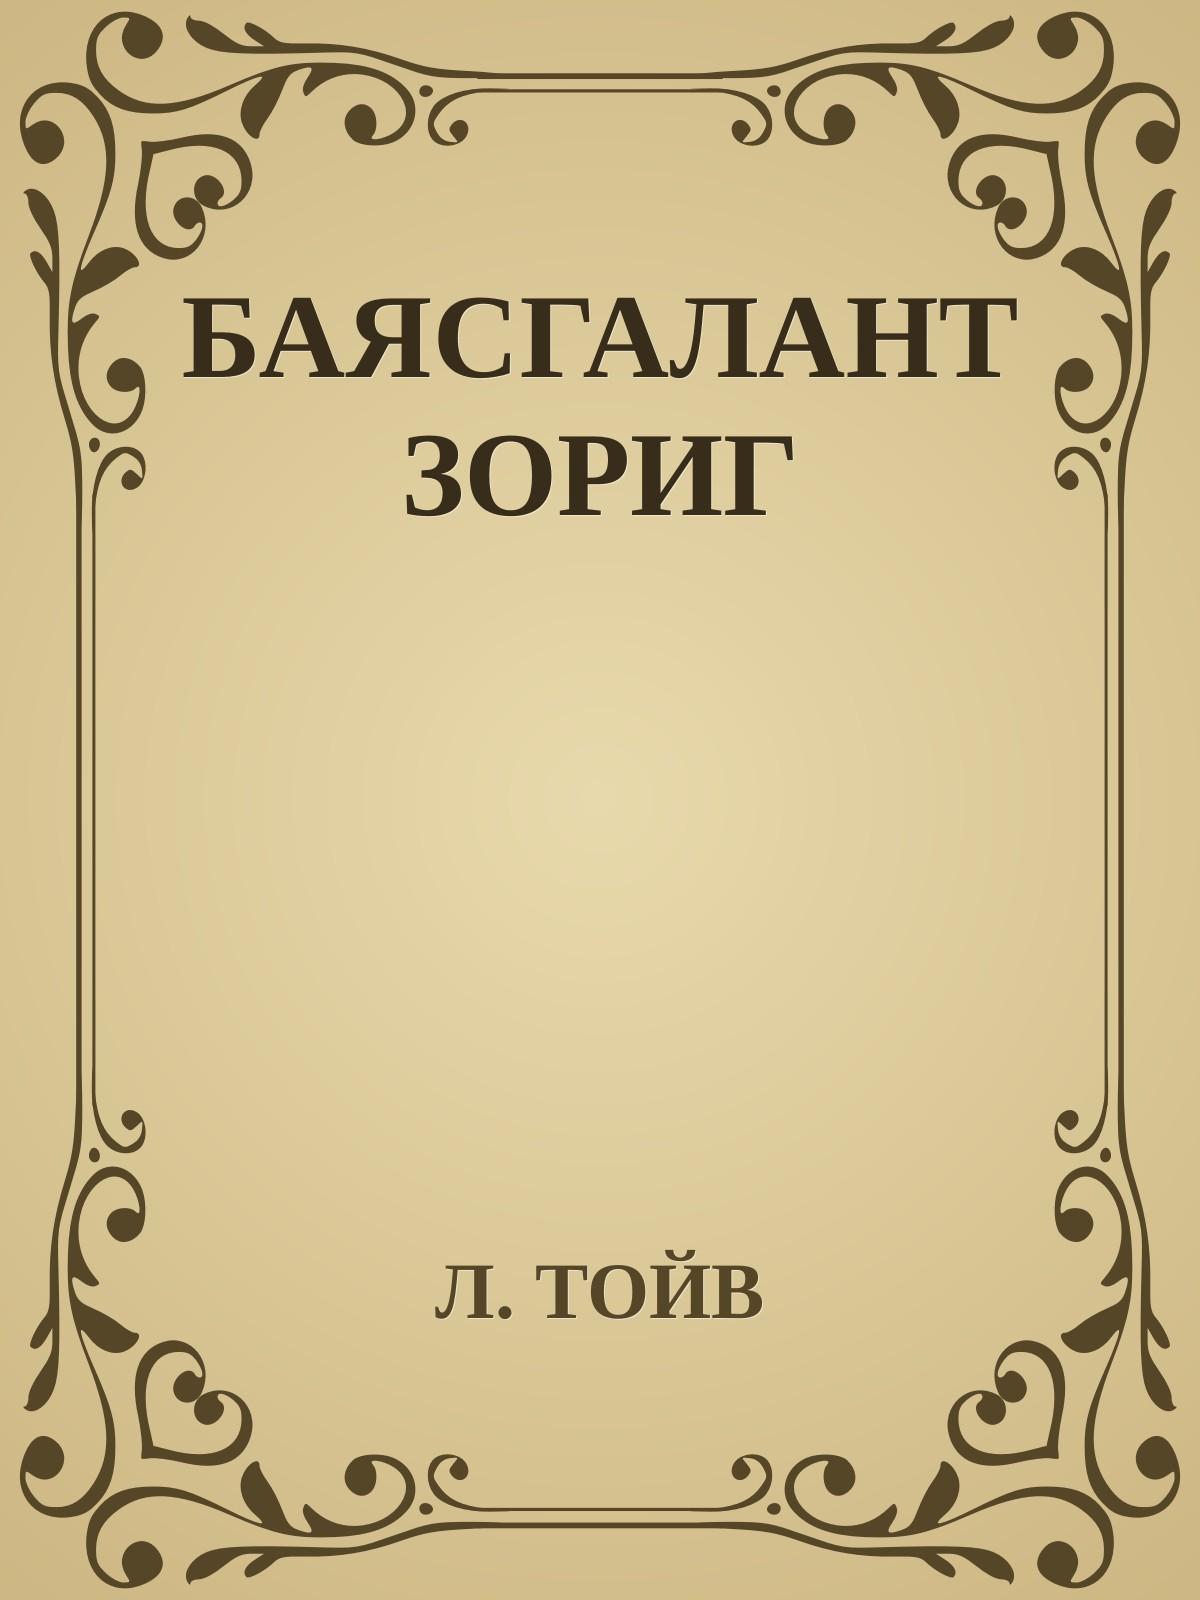 БАЯСГАЛАНТ ЗОРИГ